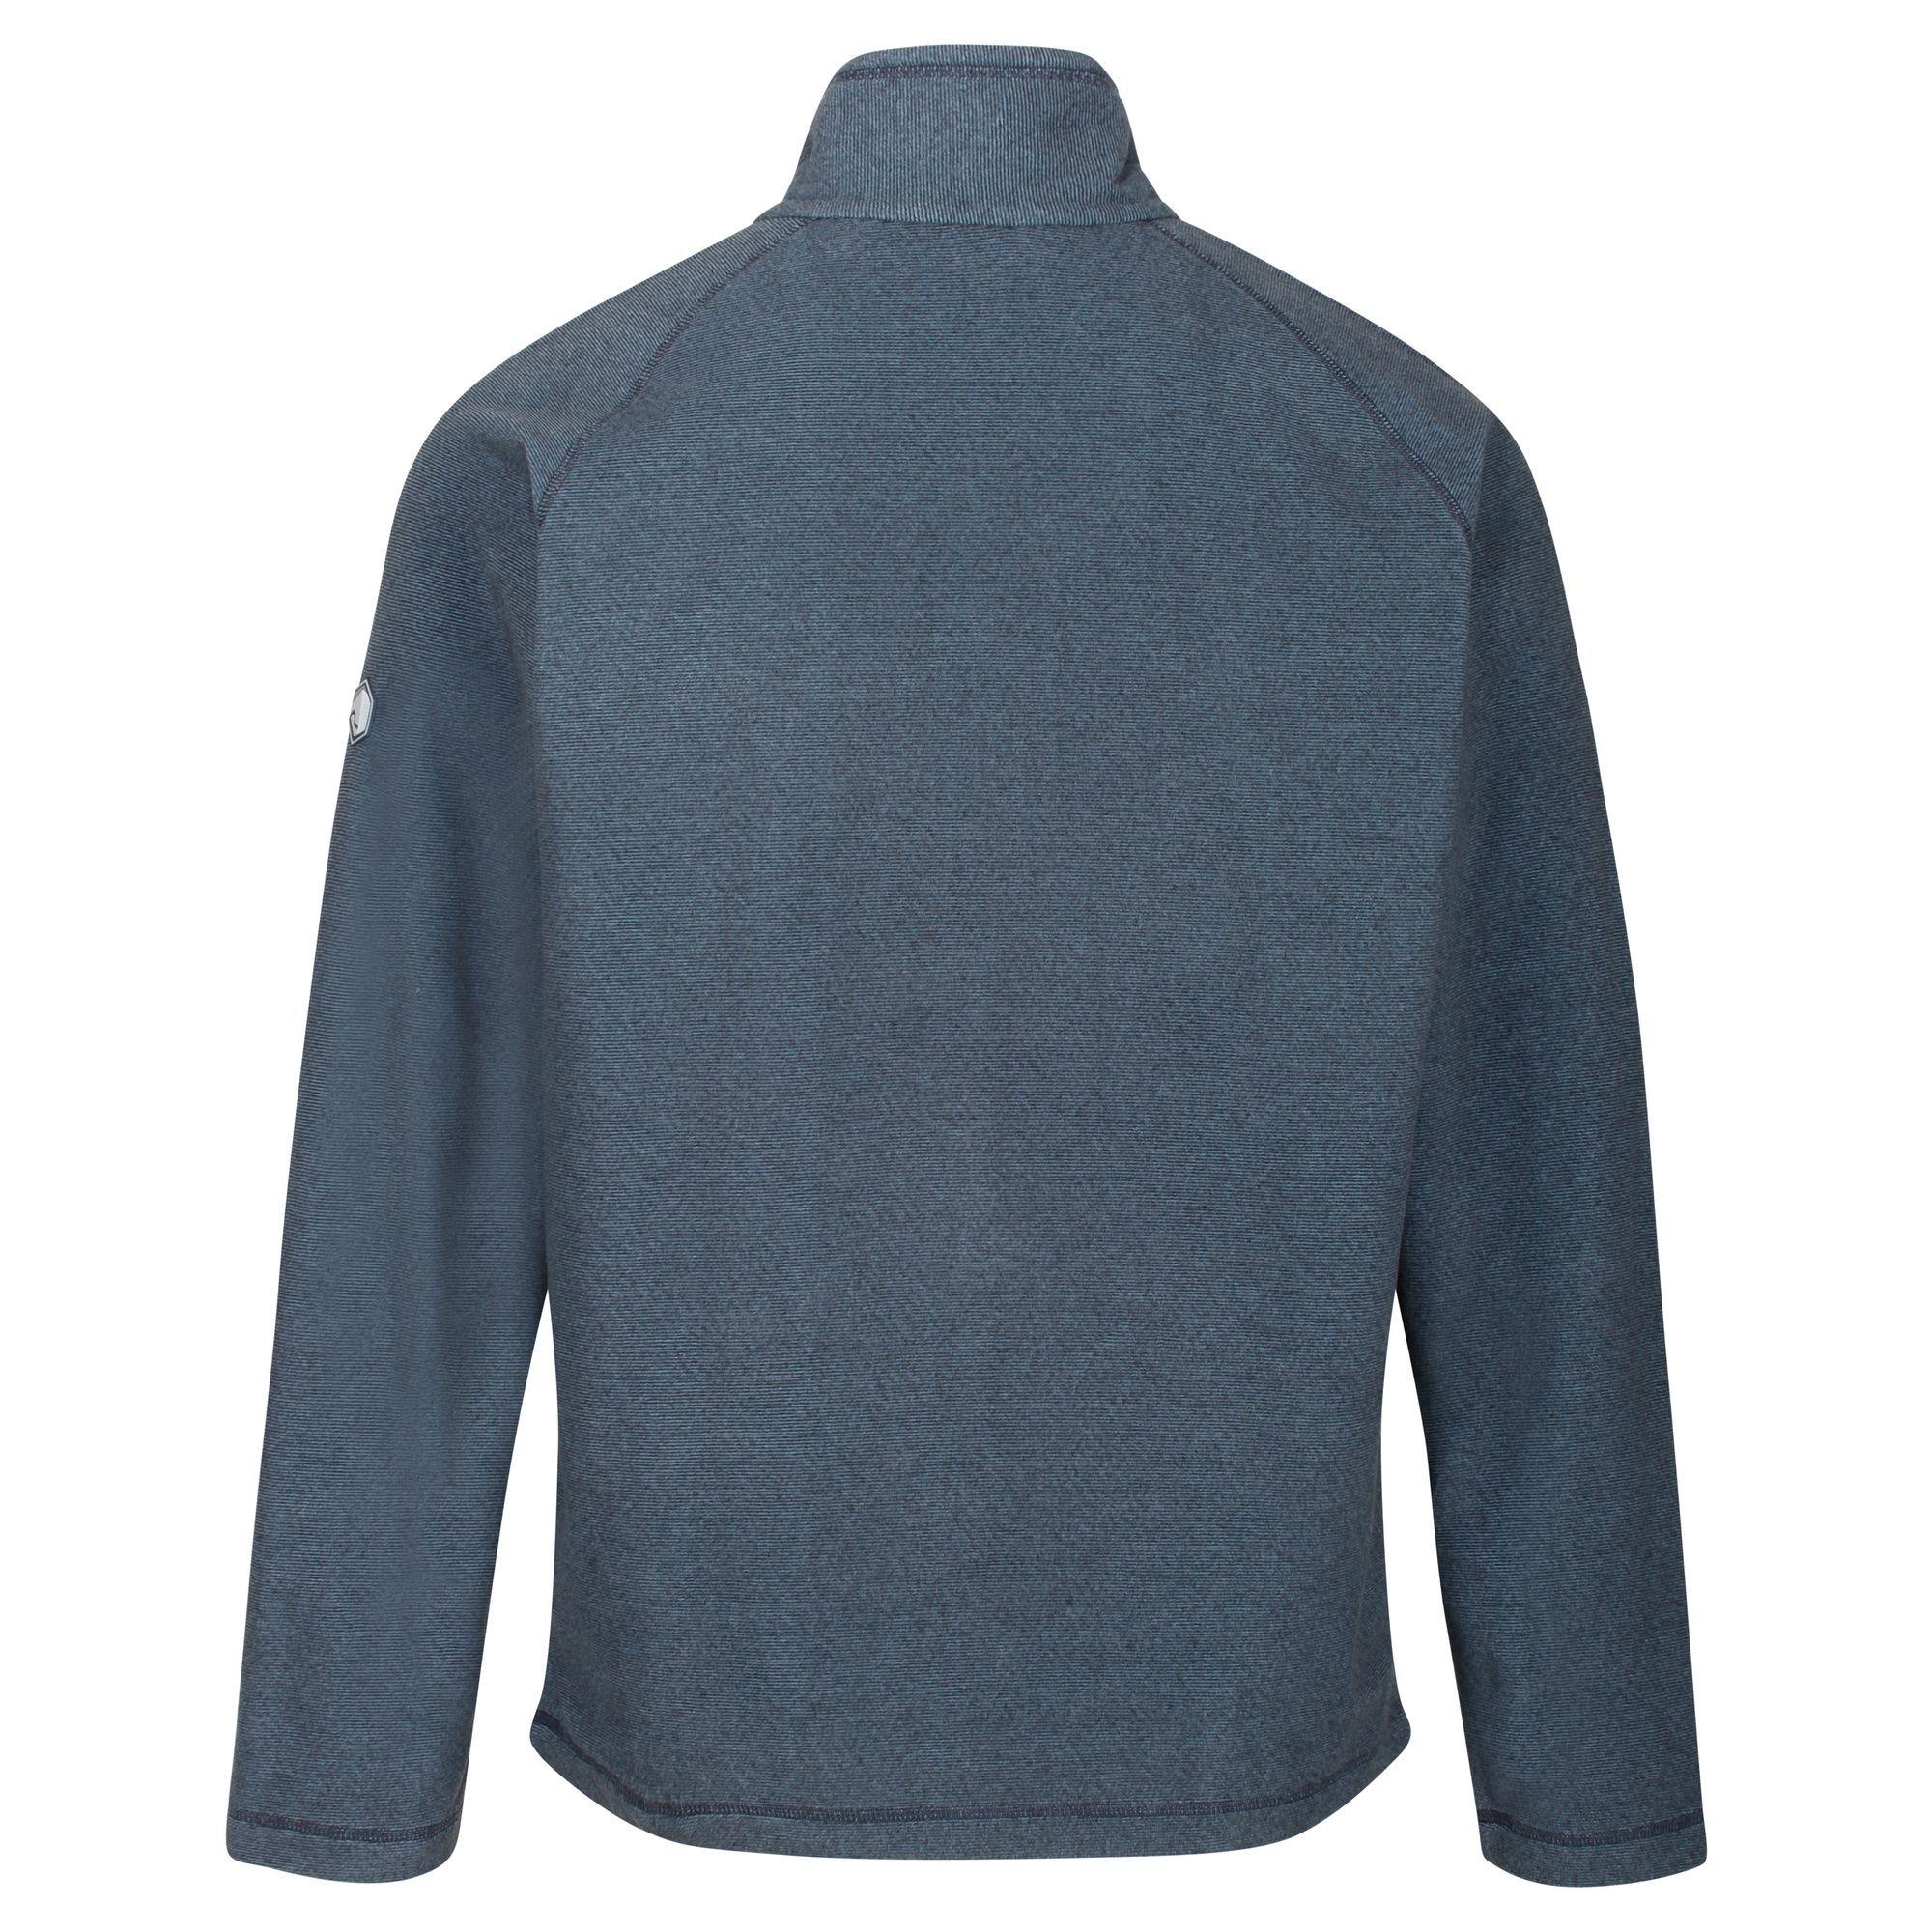 Regatta-Mens-Fleece-Jacket-Massive-Clearance-RRP-60-00 thumbnail 7